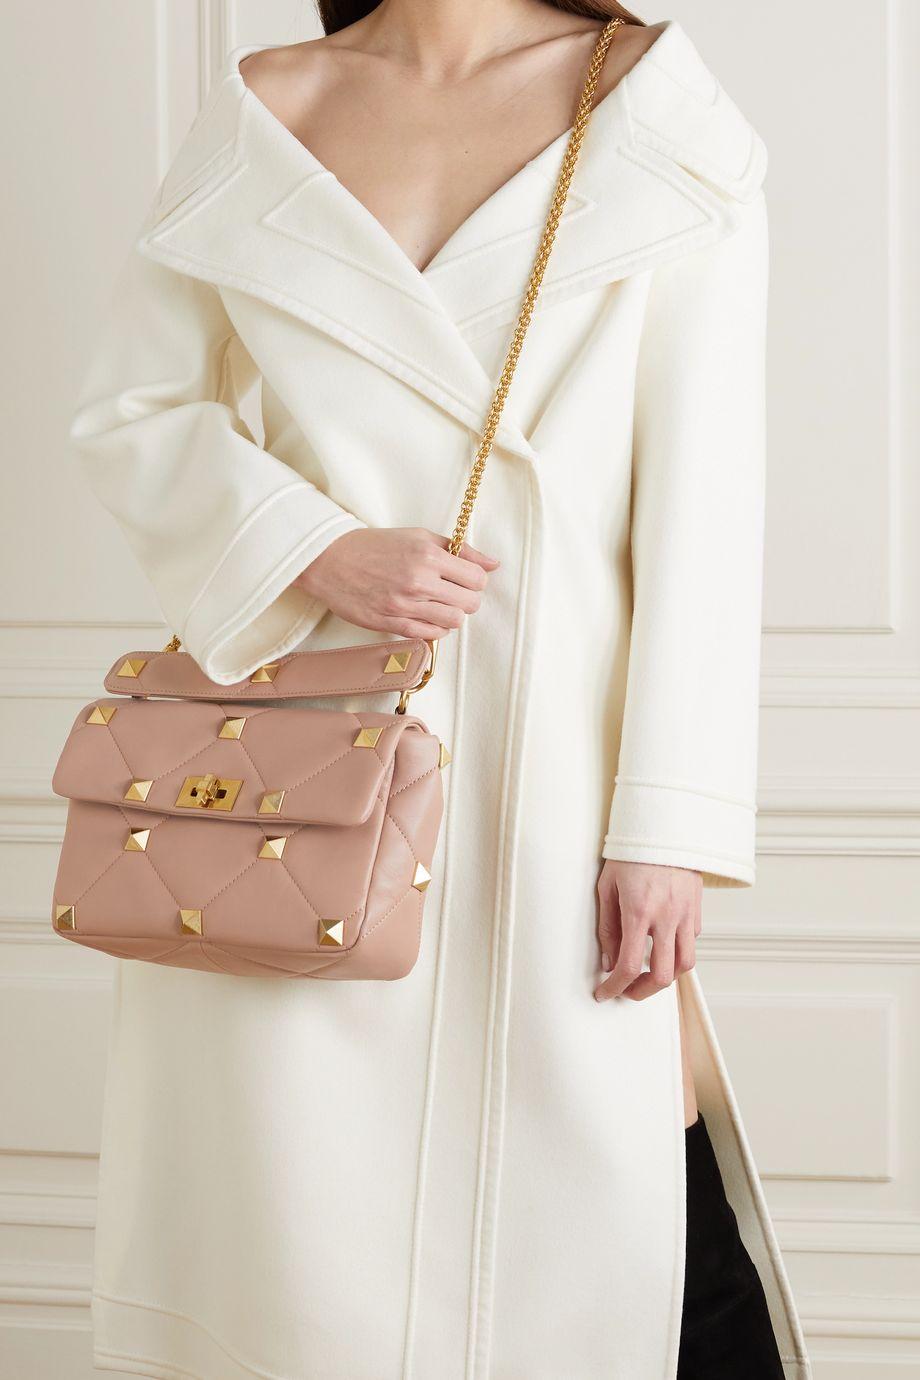 Valentino Valentino Garavani Roman Stud quilted leather shoulder bag